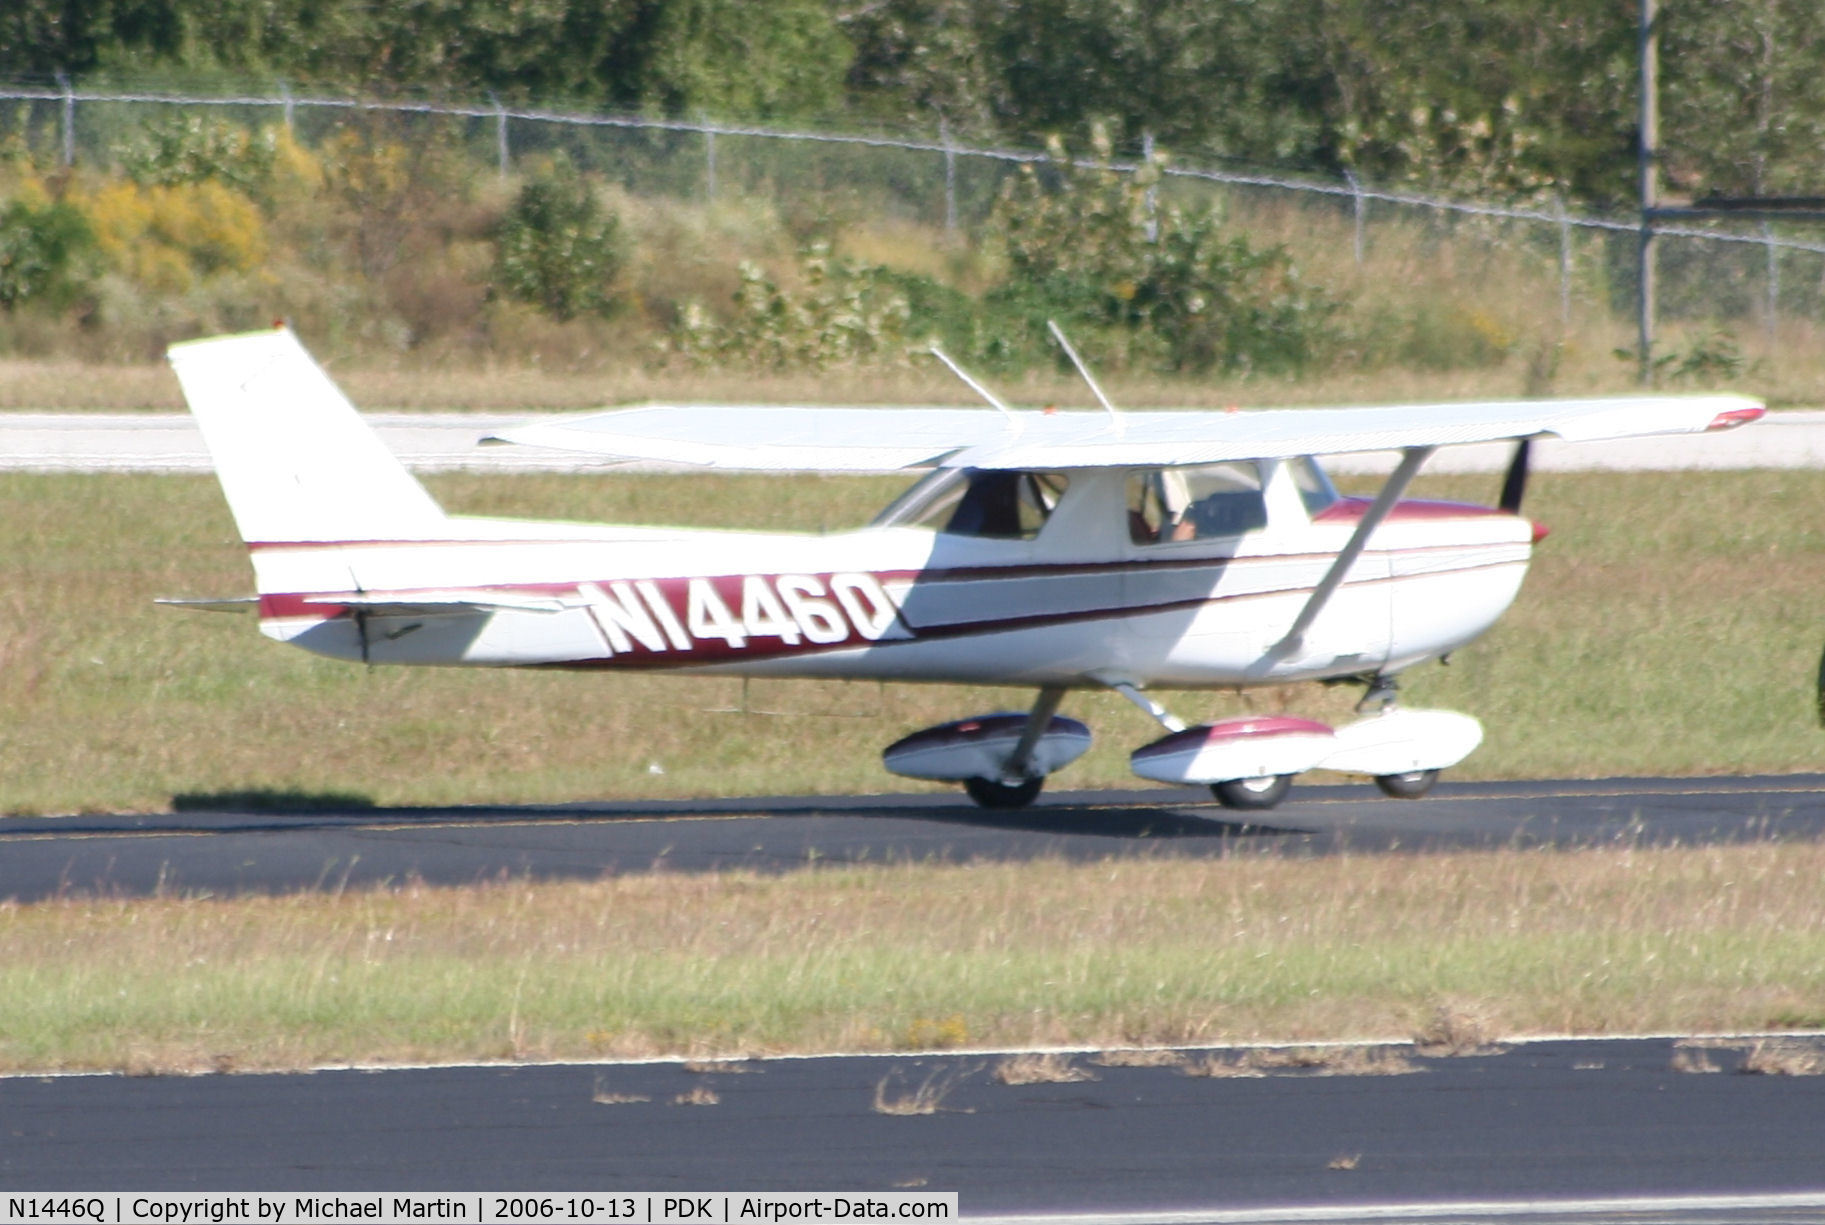 N1446Q, 1971 Cessna 150L C/N 15072746, Taxing to Runway 34